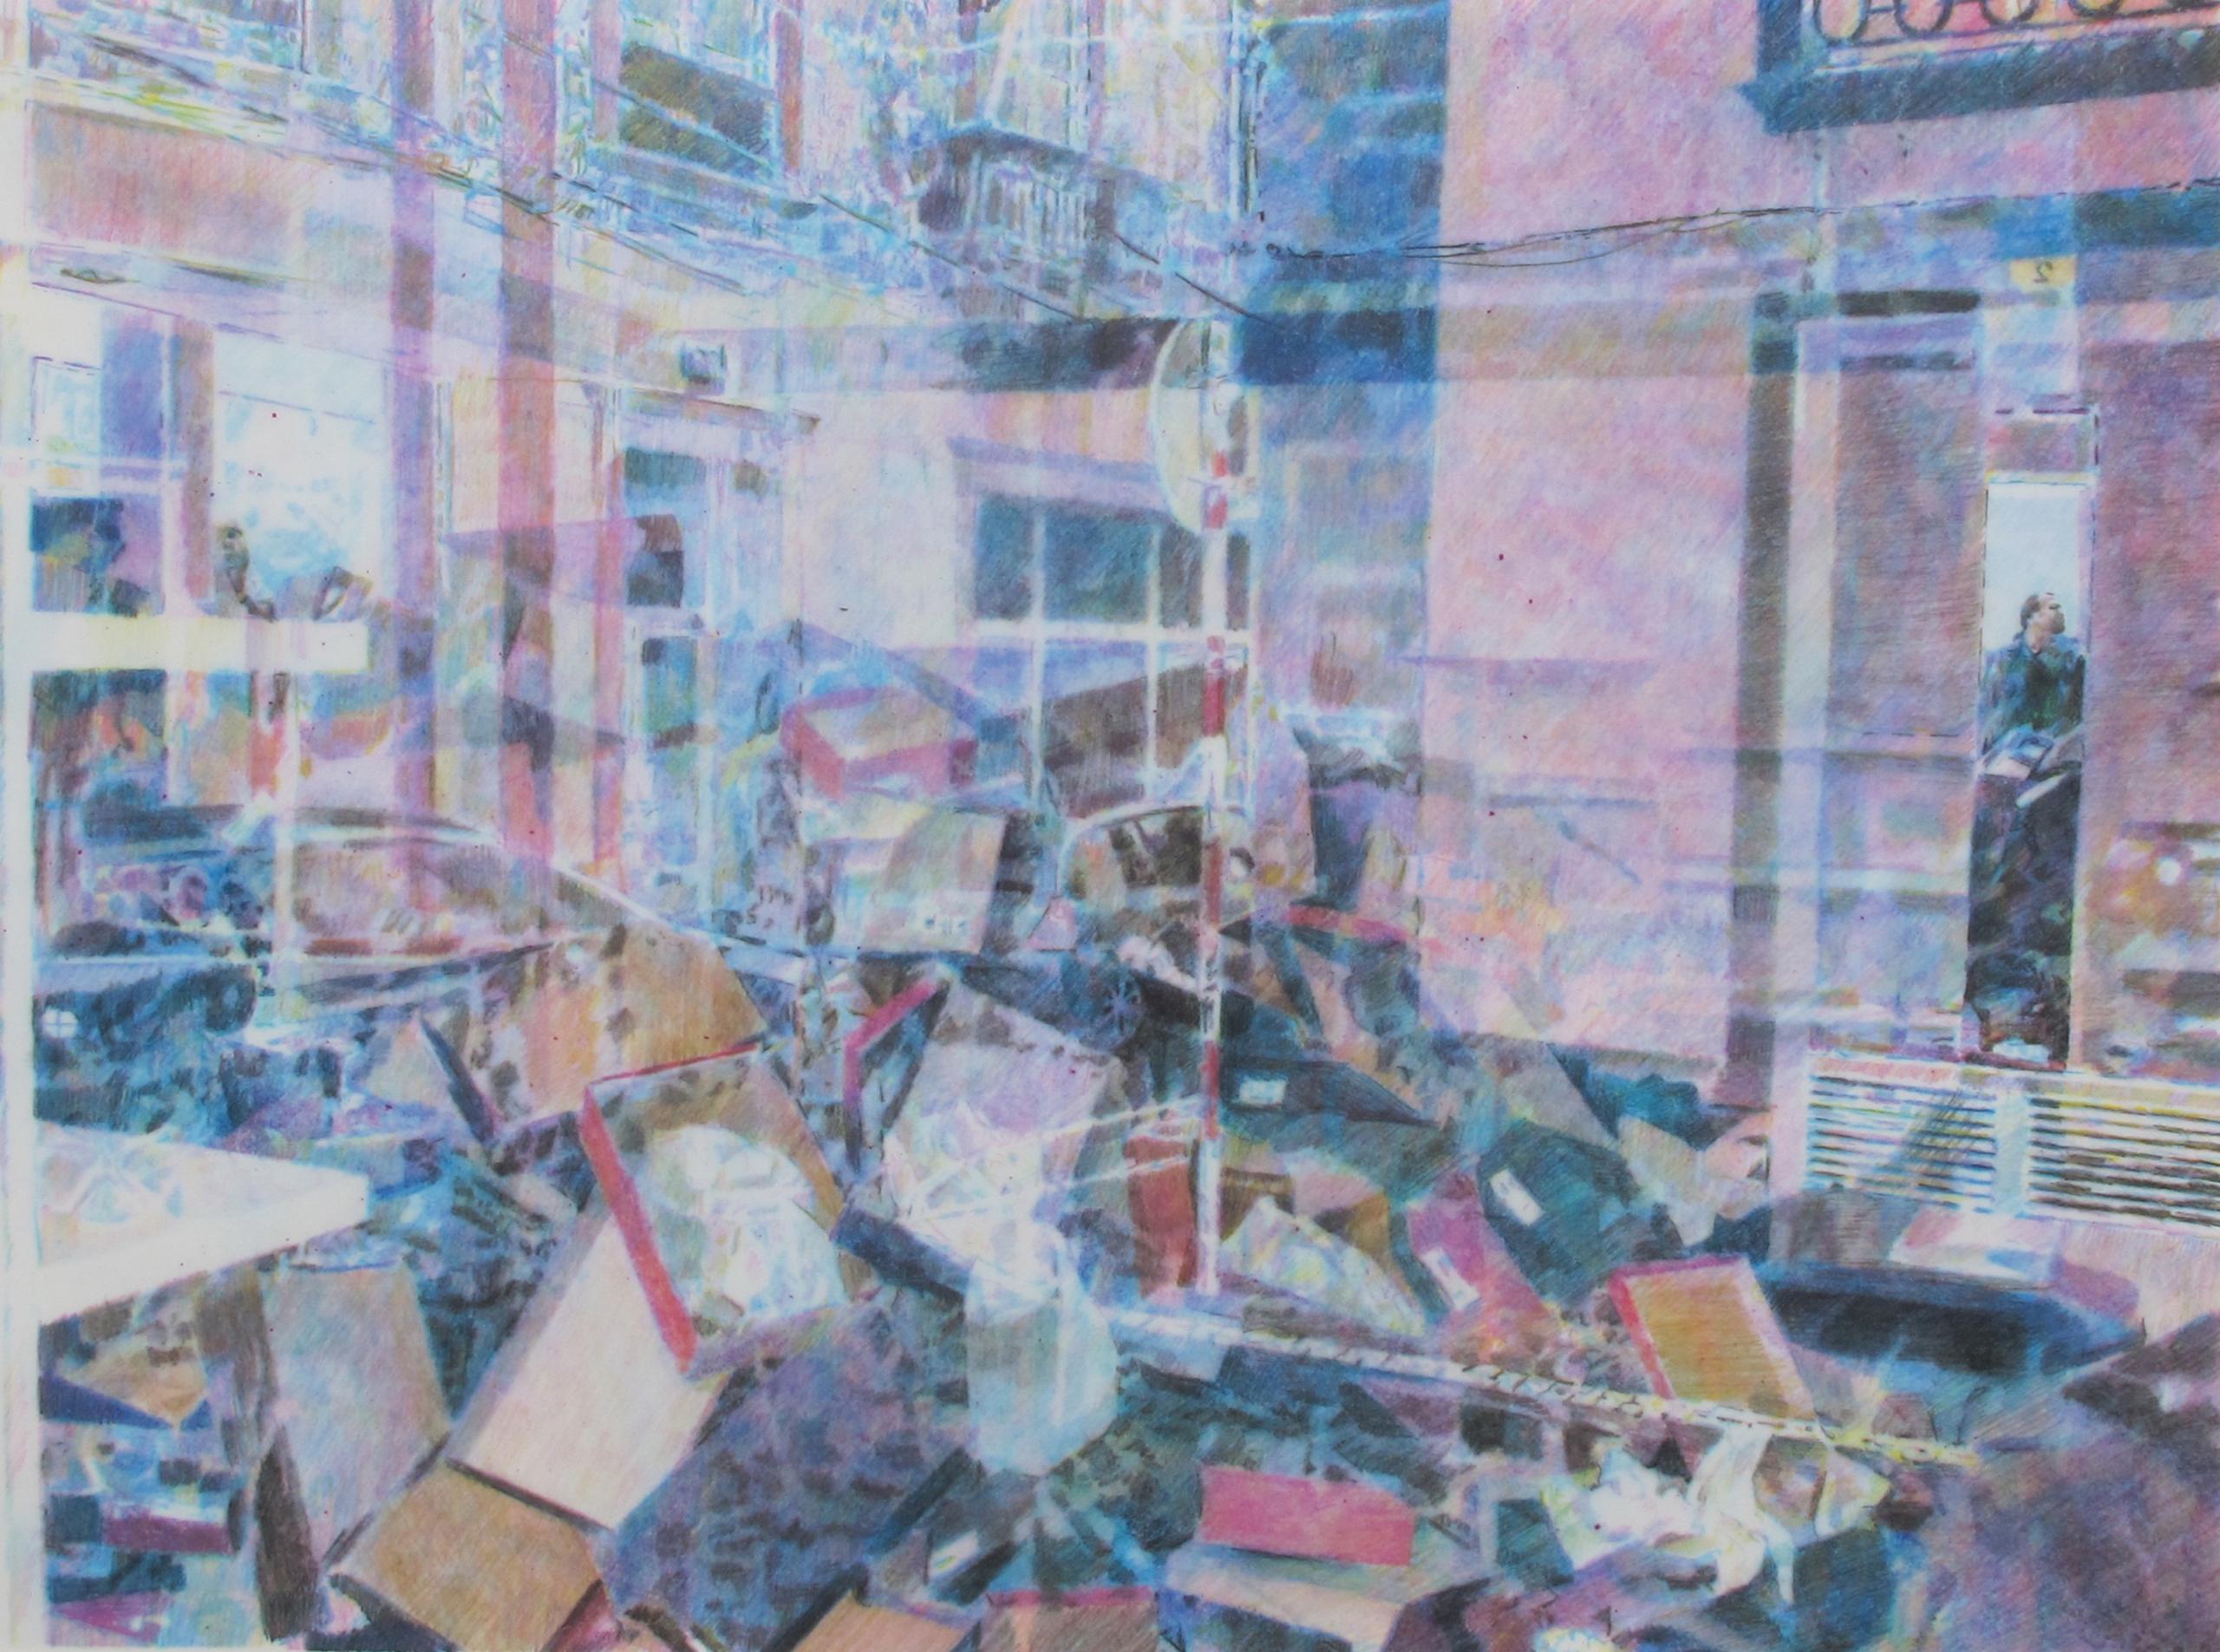 "Stephen Andrews, Punto, 2013. Watercolour crayon on mylar, 27 x 35""."